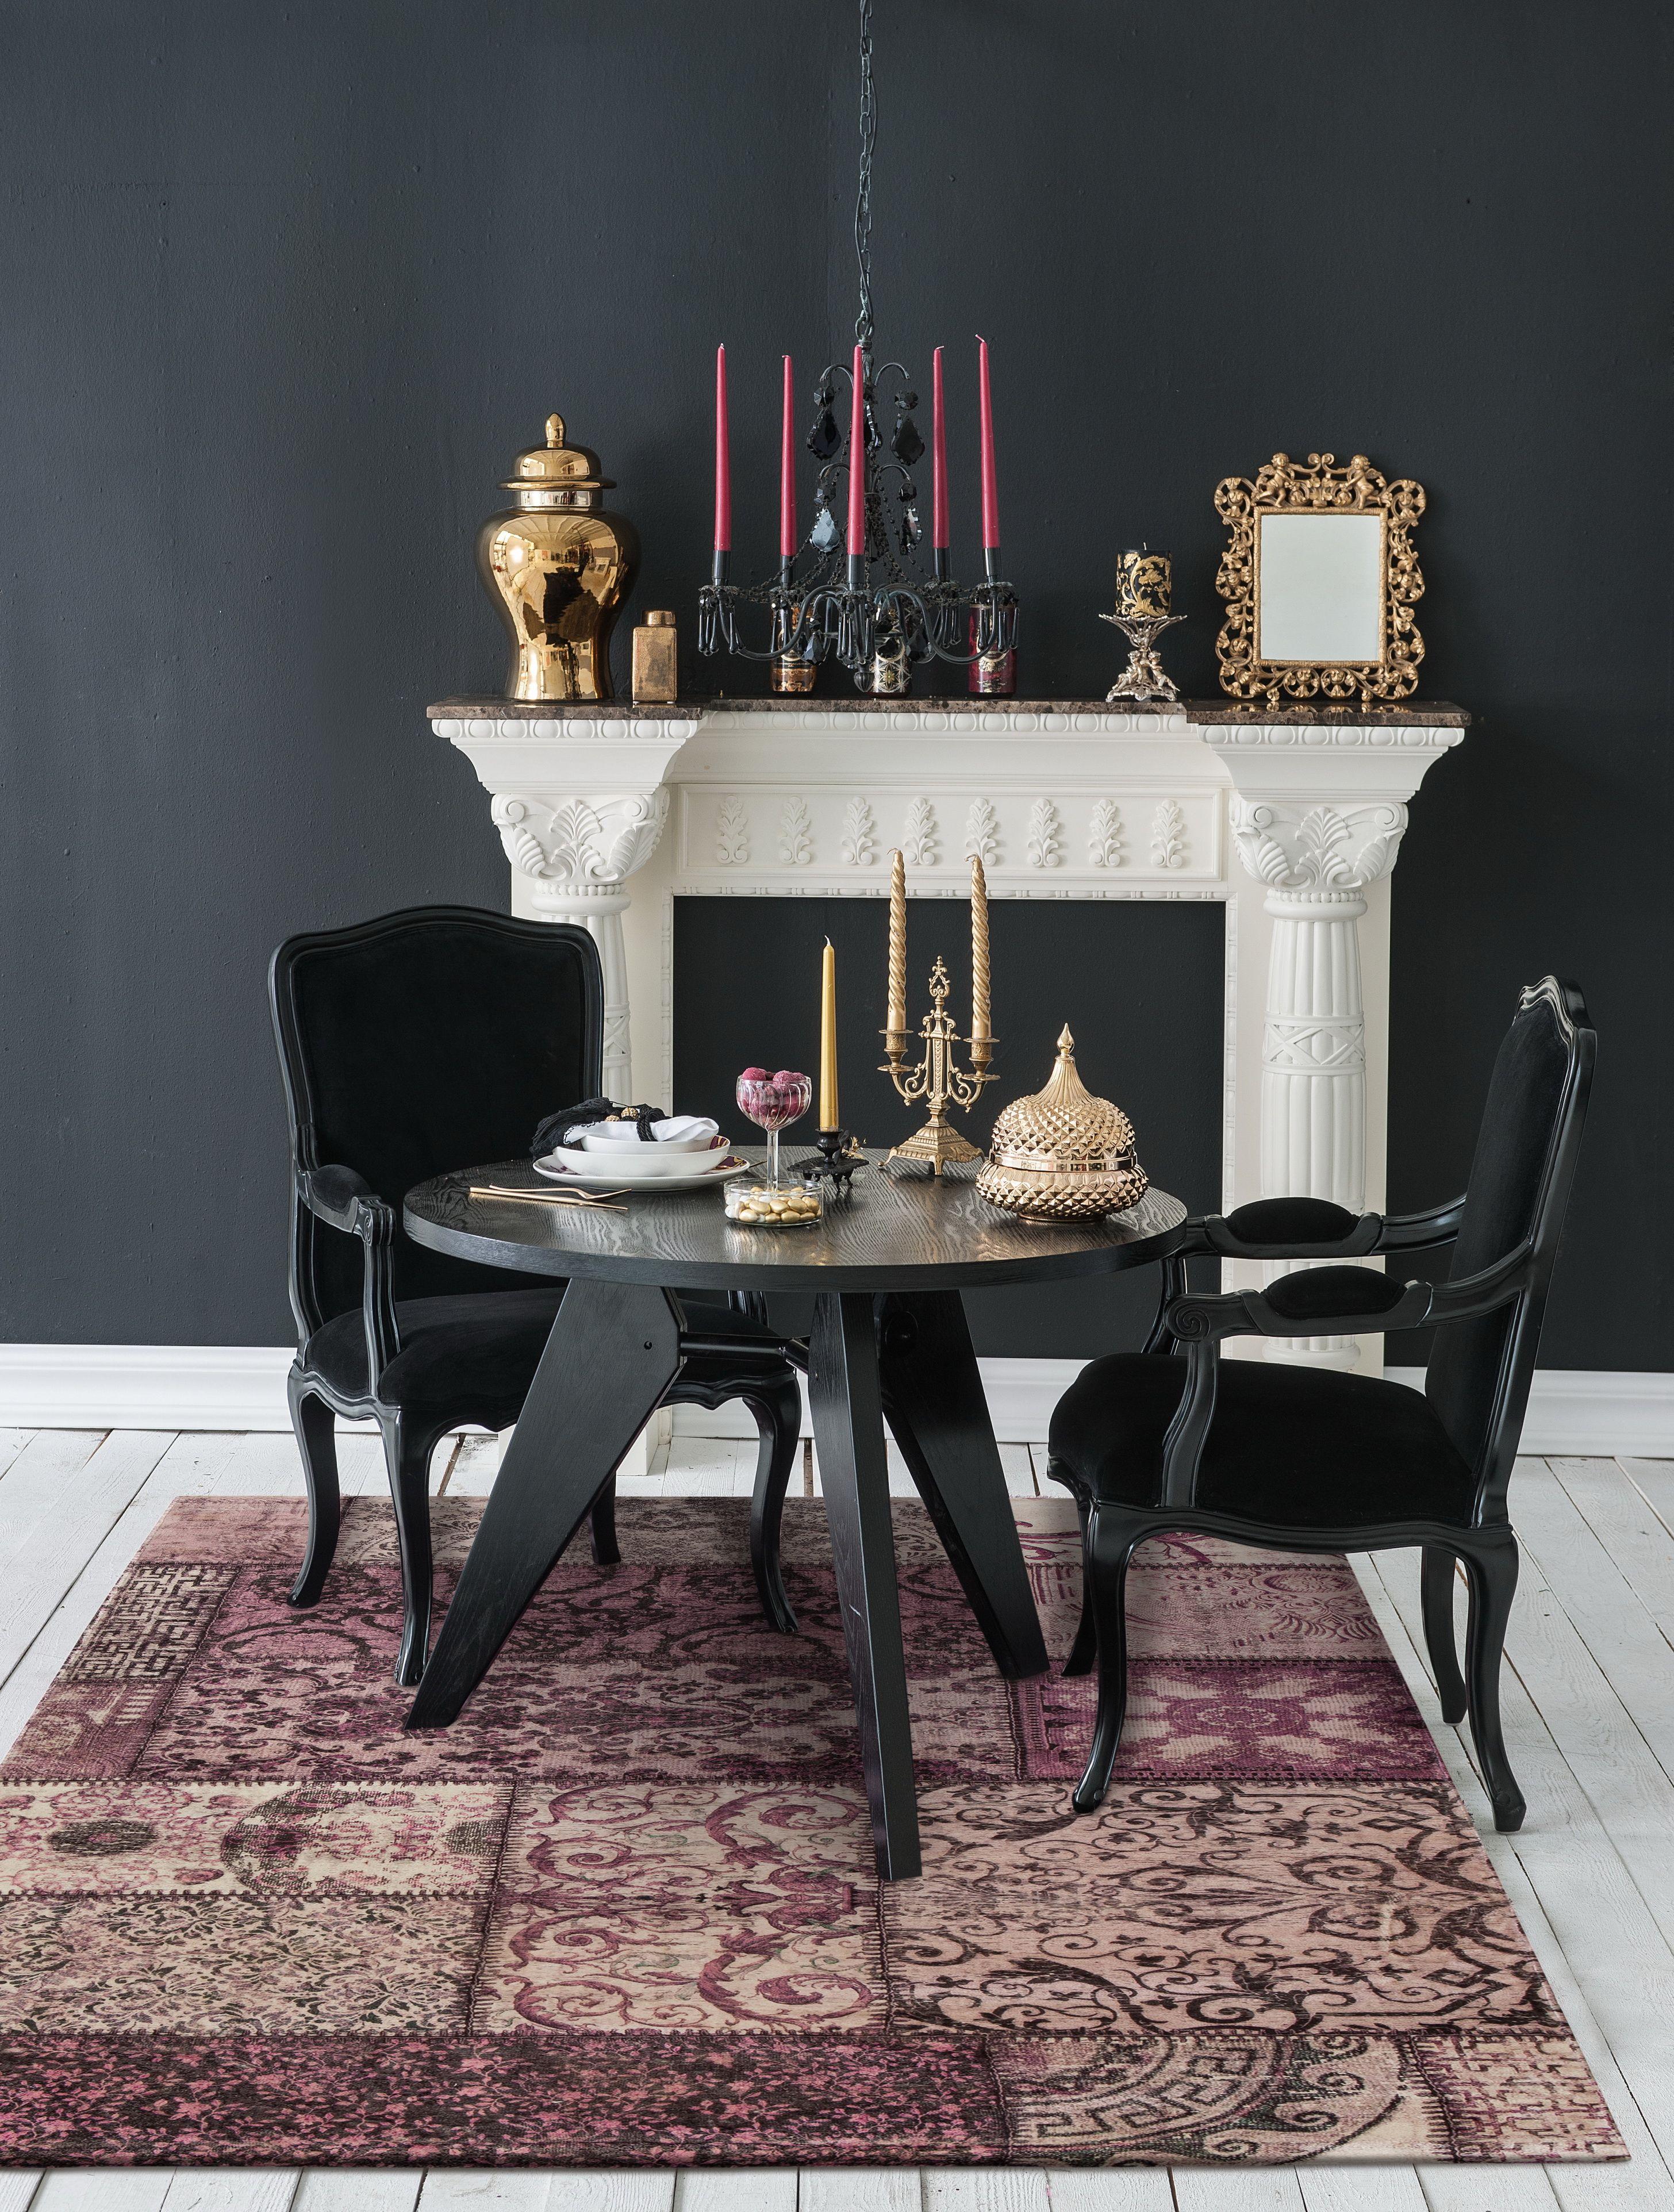 Patchwork design carpet | Sweet home, Nevresim takimi, Evler